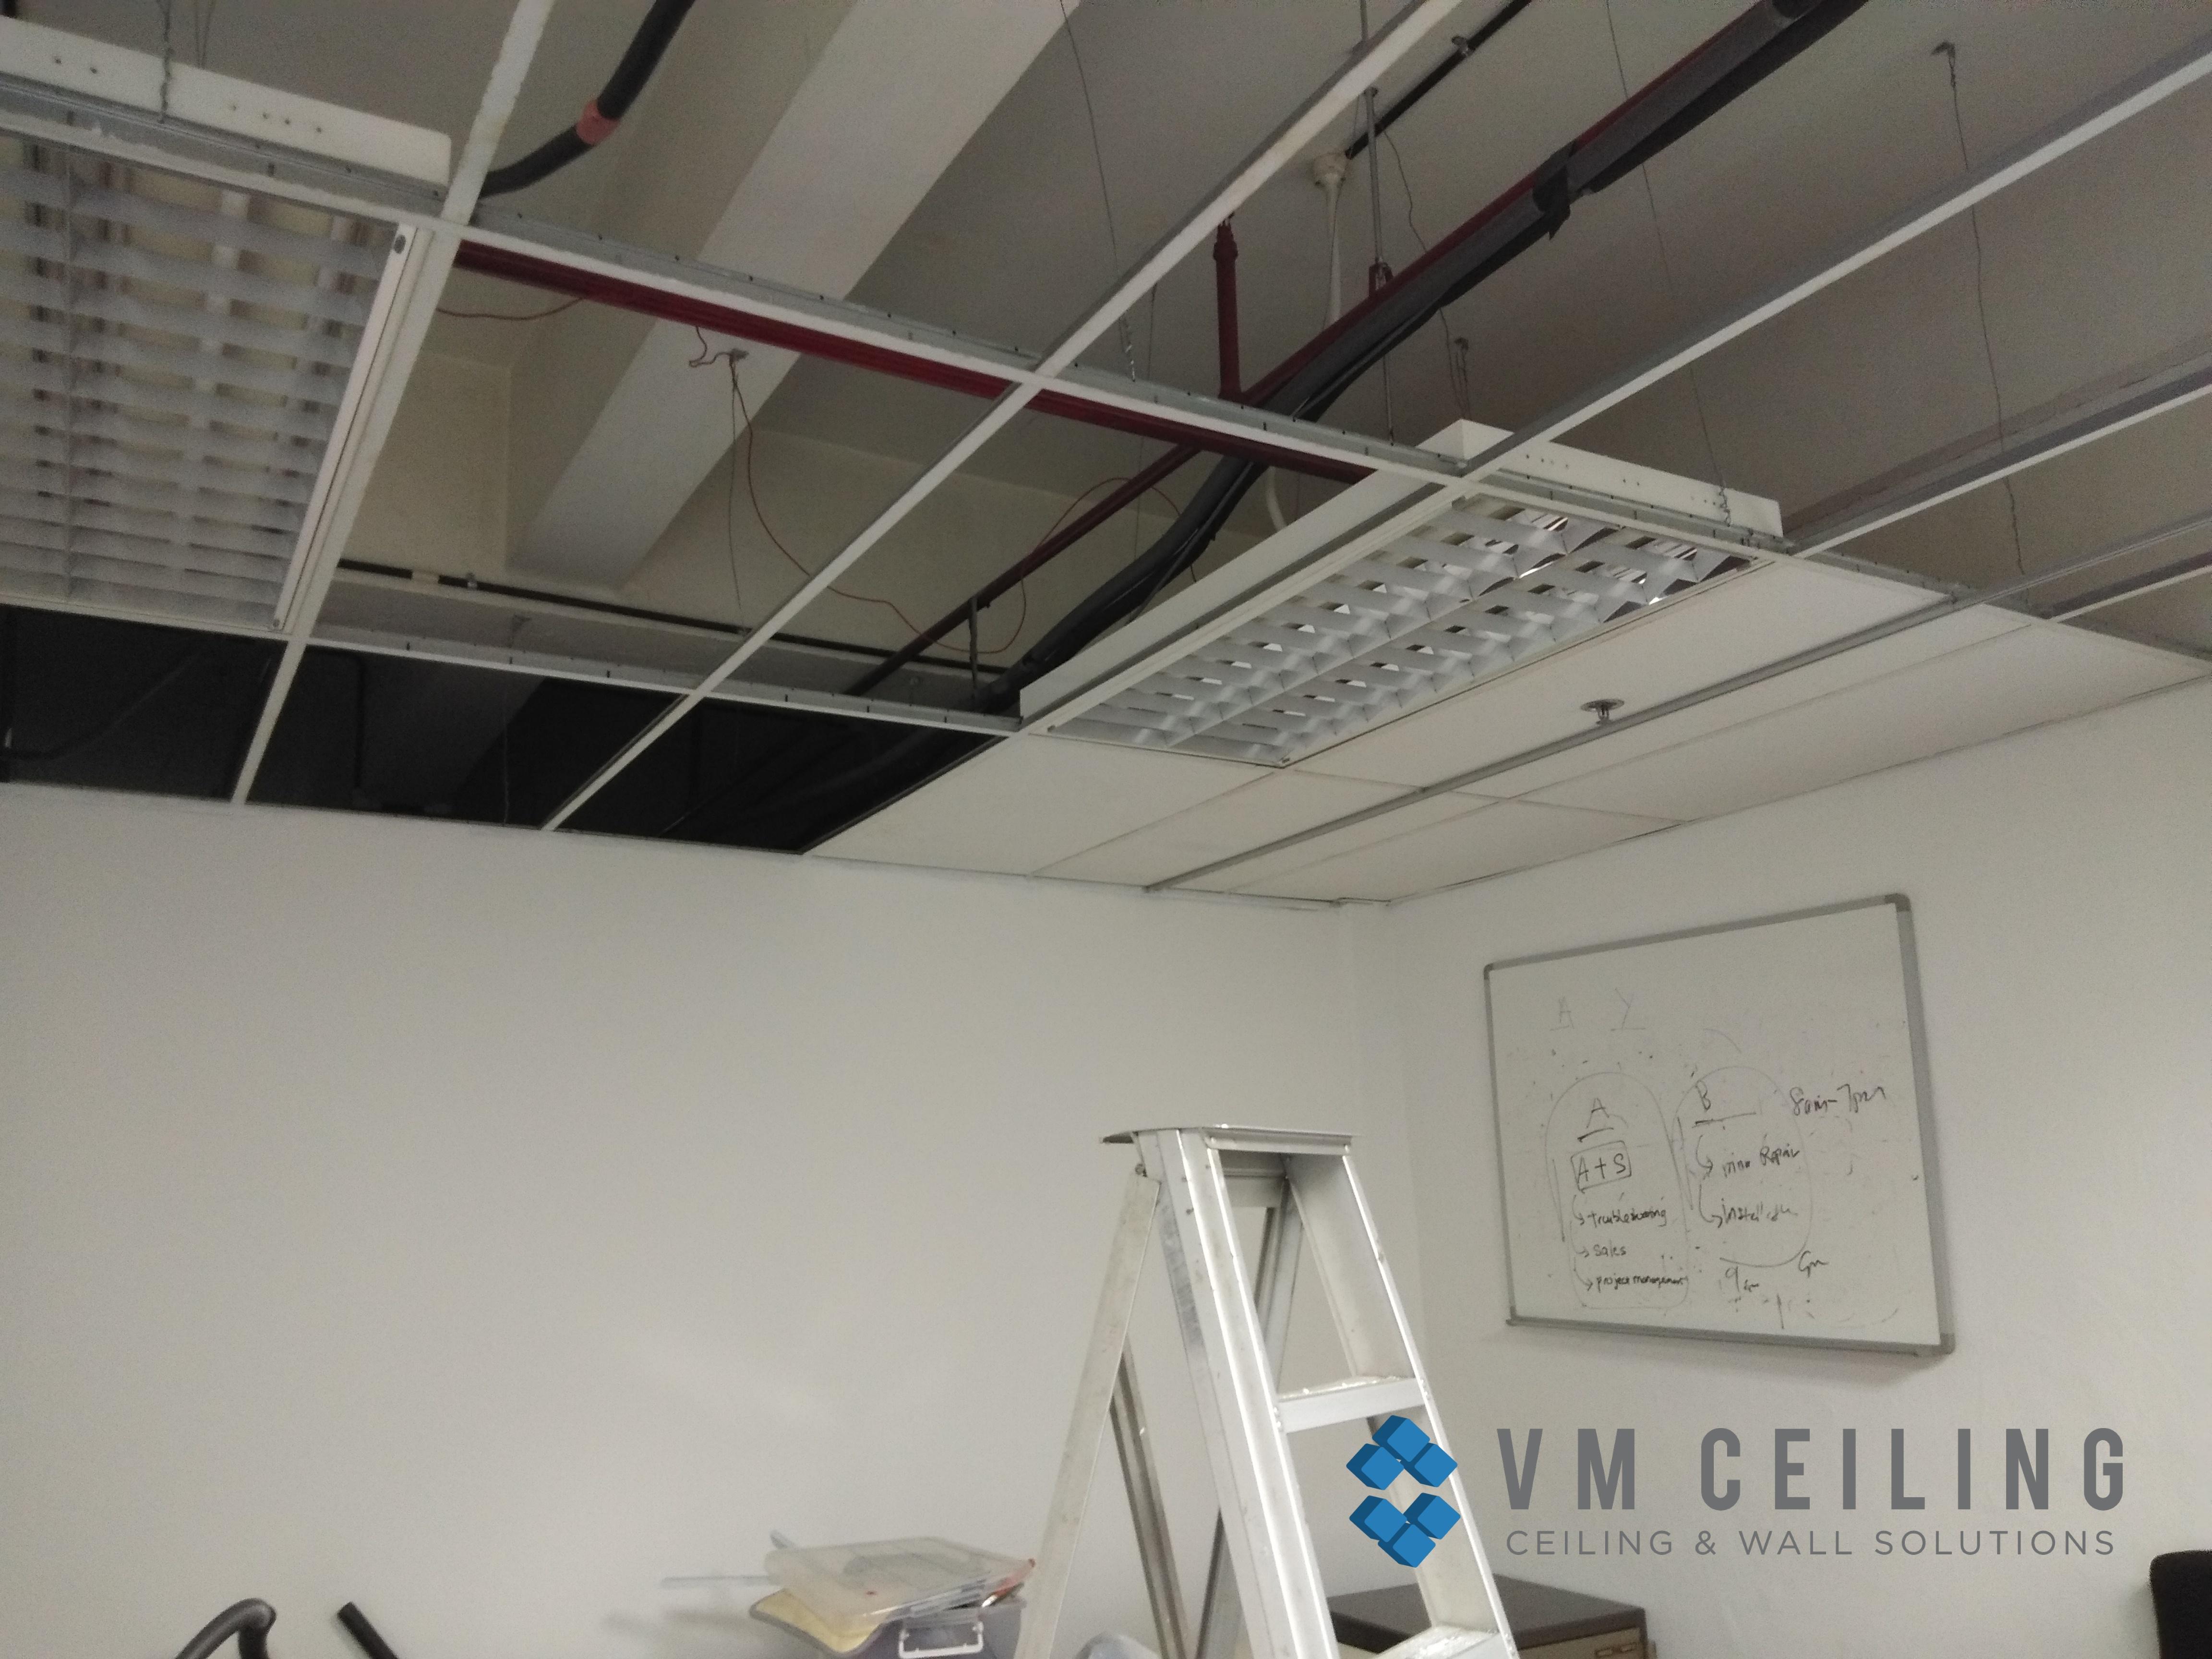 office meeting room false ceiling renovation vm ceiling singapore commercial bukit merah 1